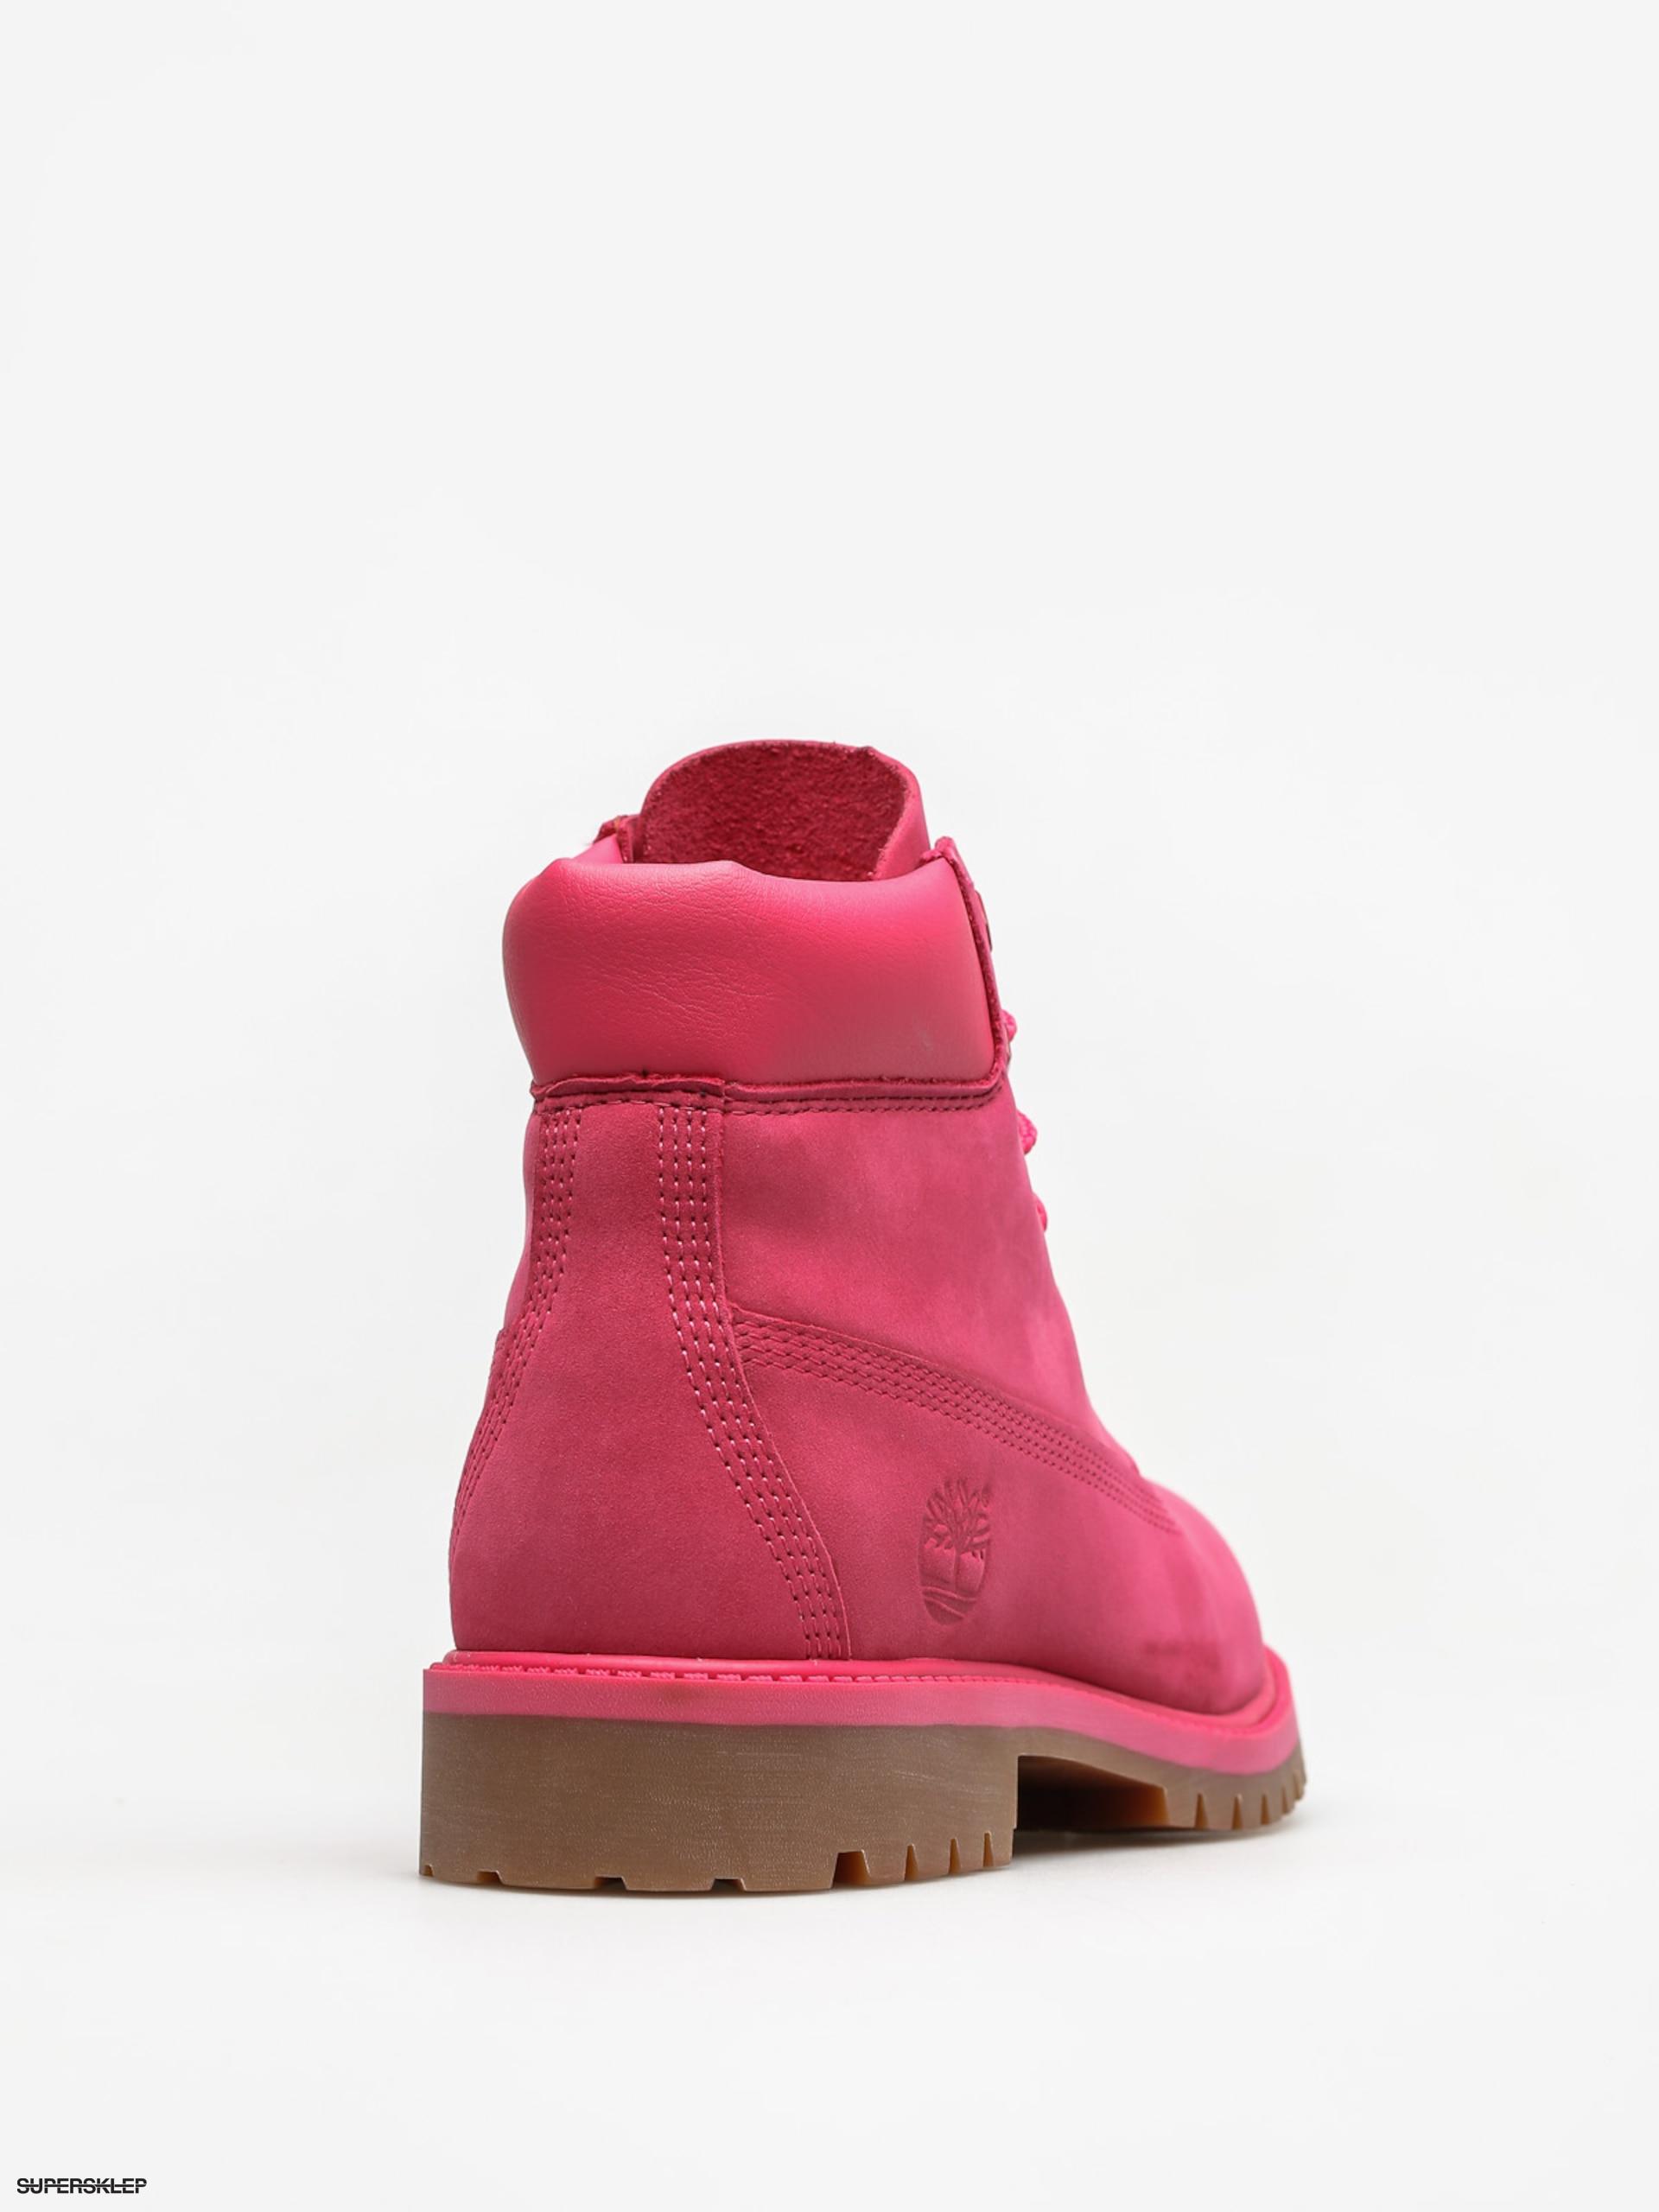 fb63320781f Dětské boty 6 Timberland In Premium Wp (bright pink nubuck)